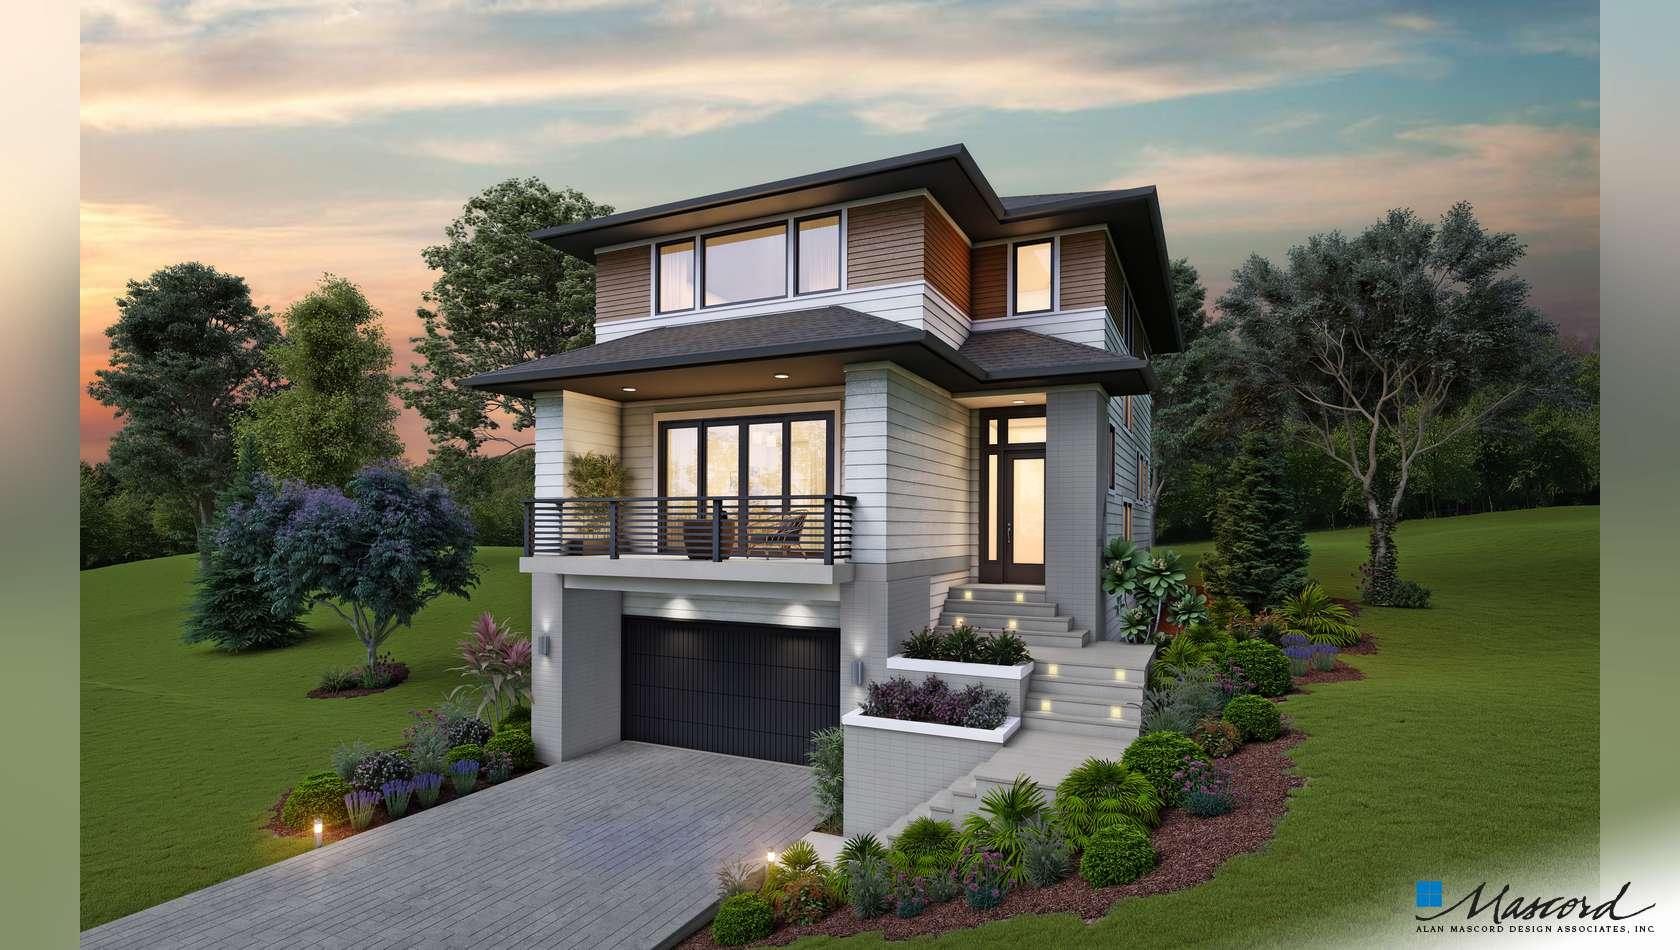 Main image for house plan 22202: The Bingley